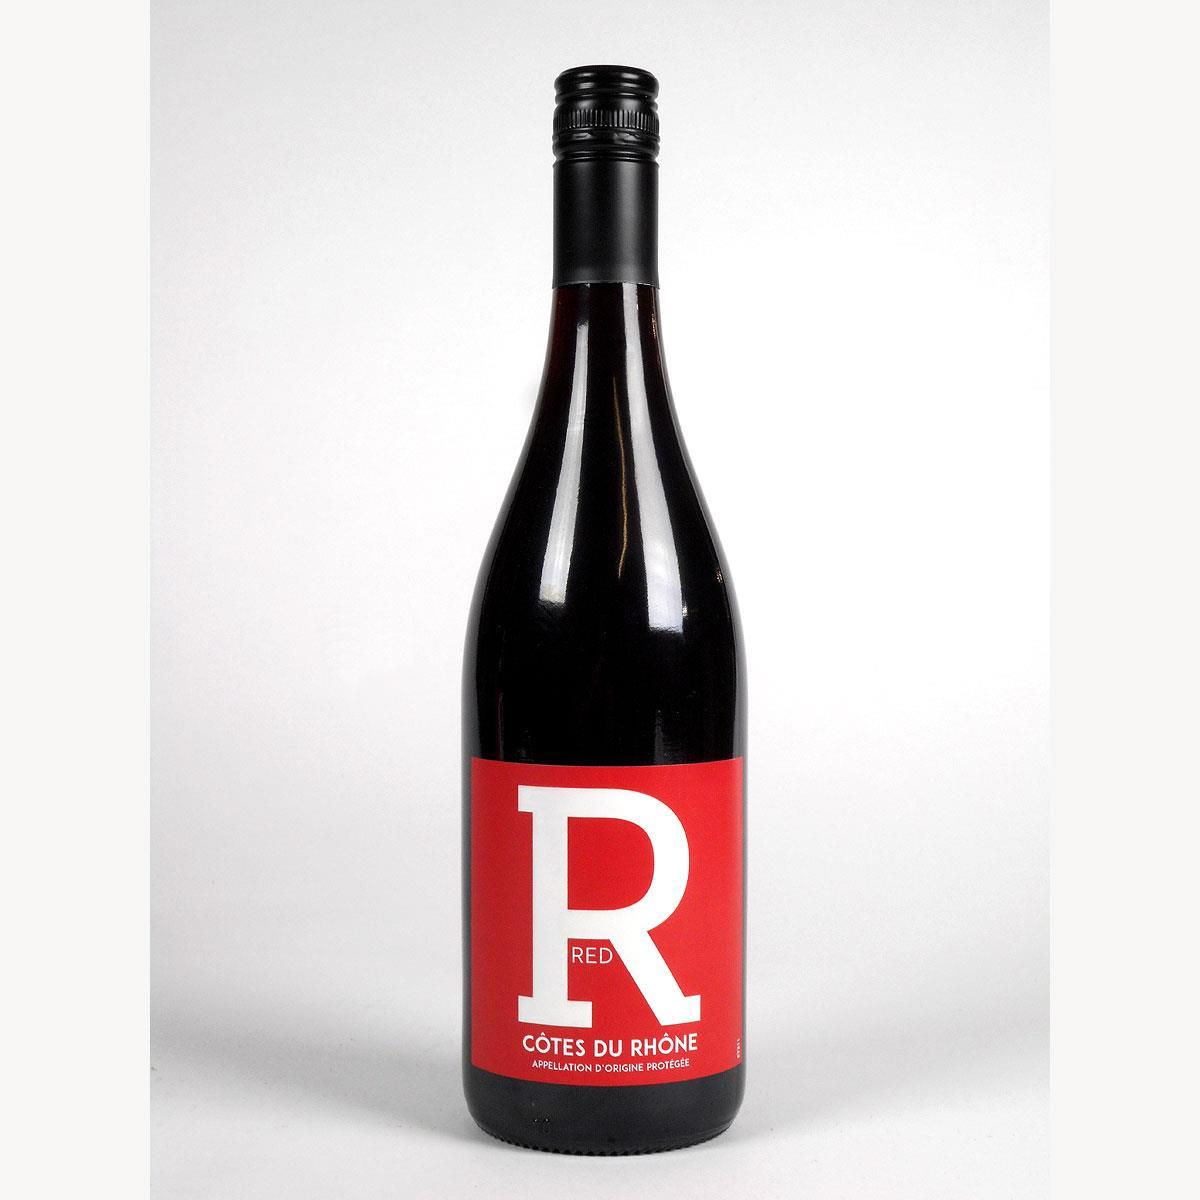 Yapp Côtes du Rhône Red 2018 - Bottle